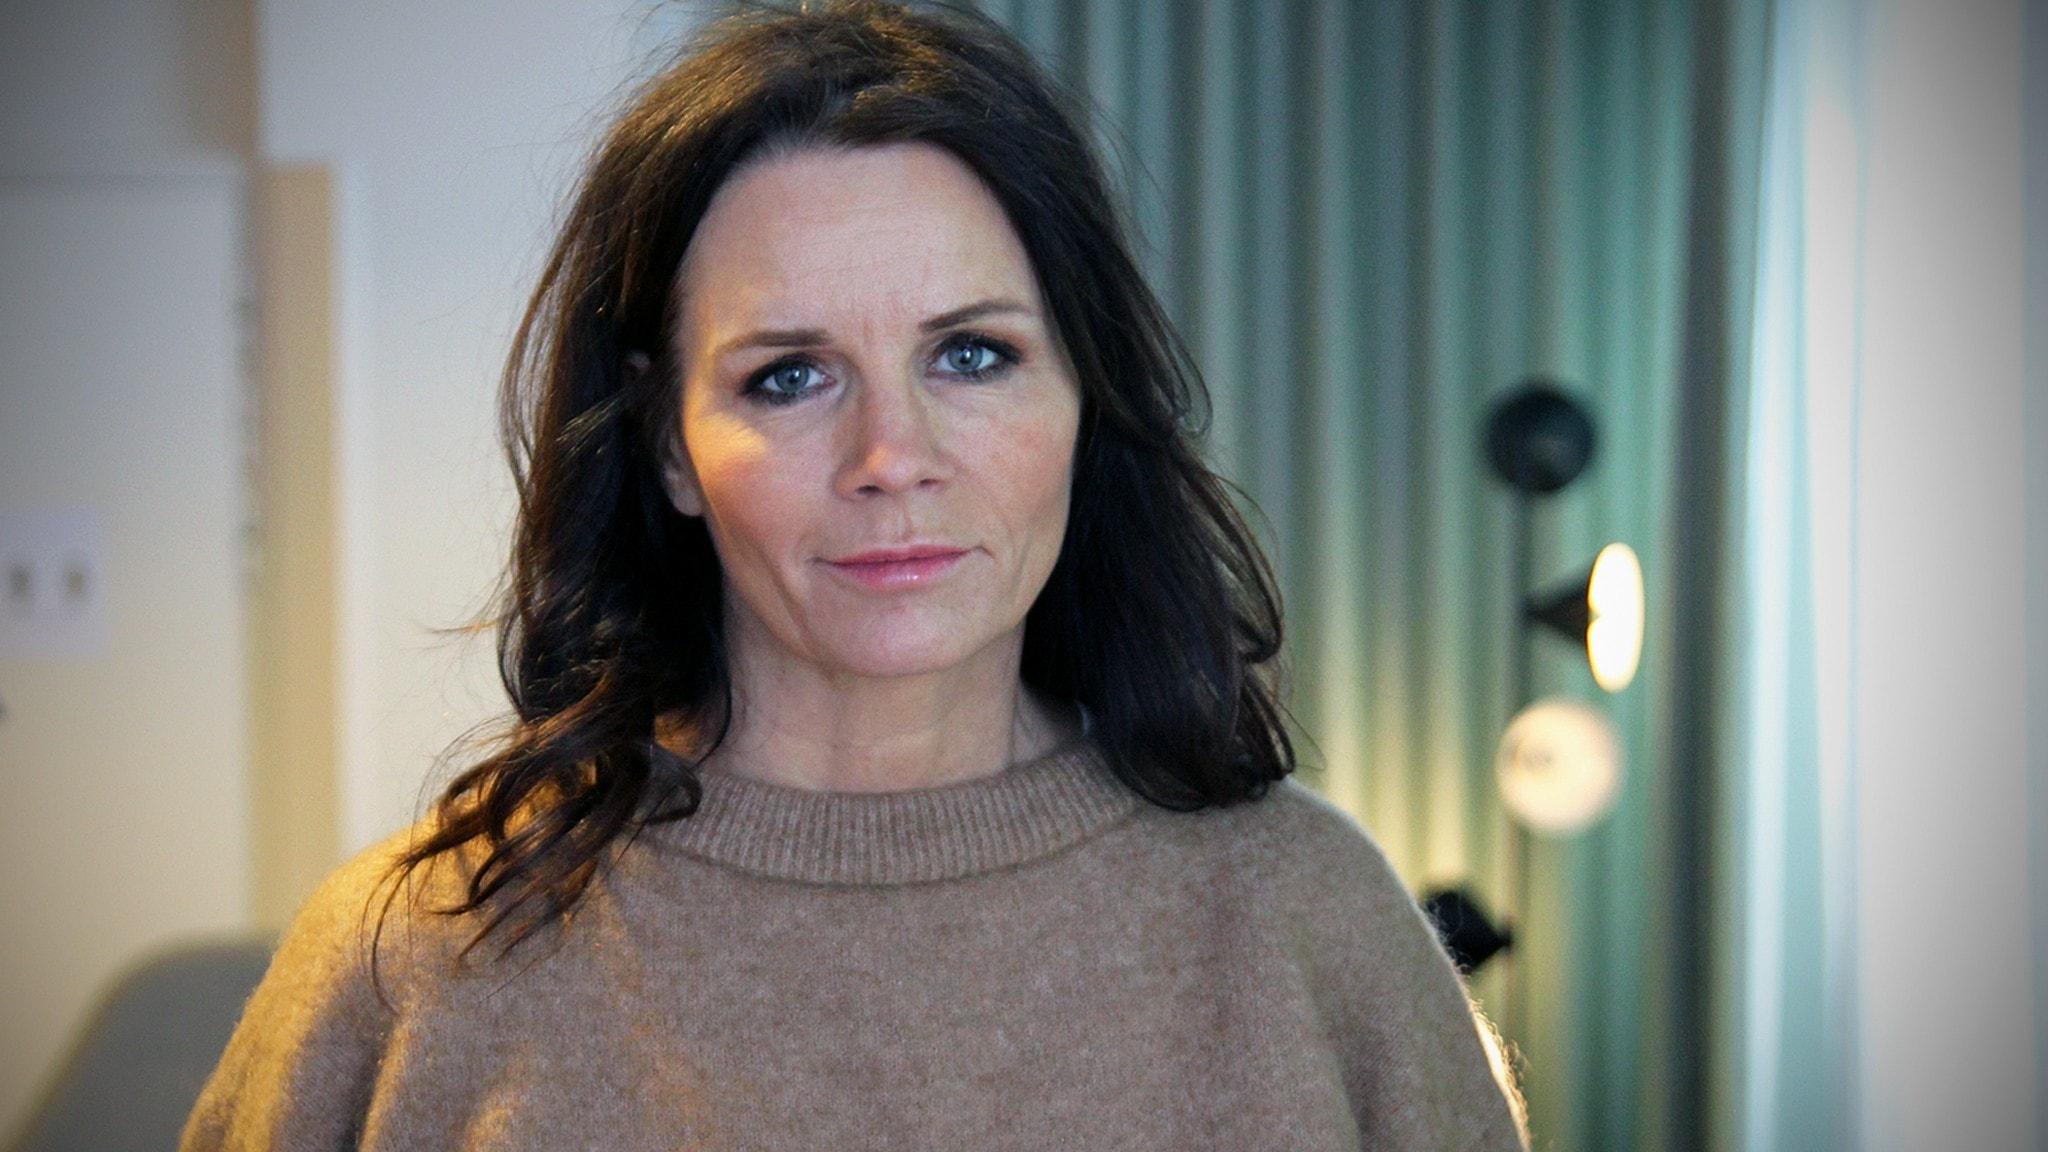 Lena Philipsson: